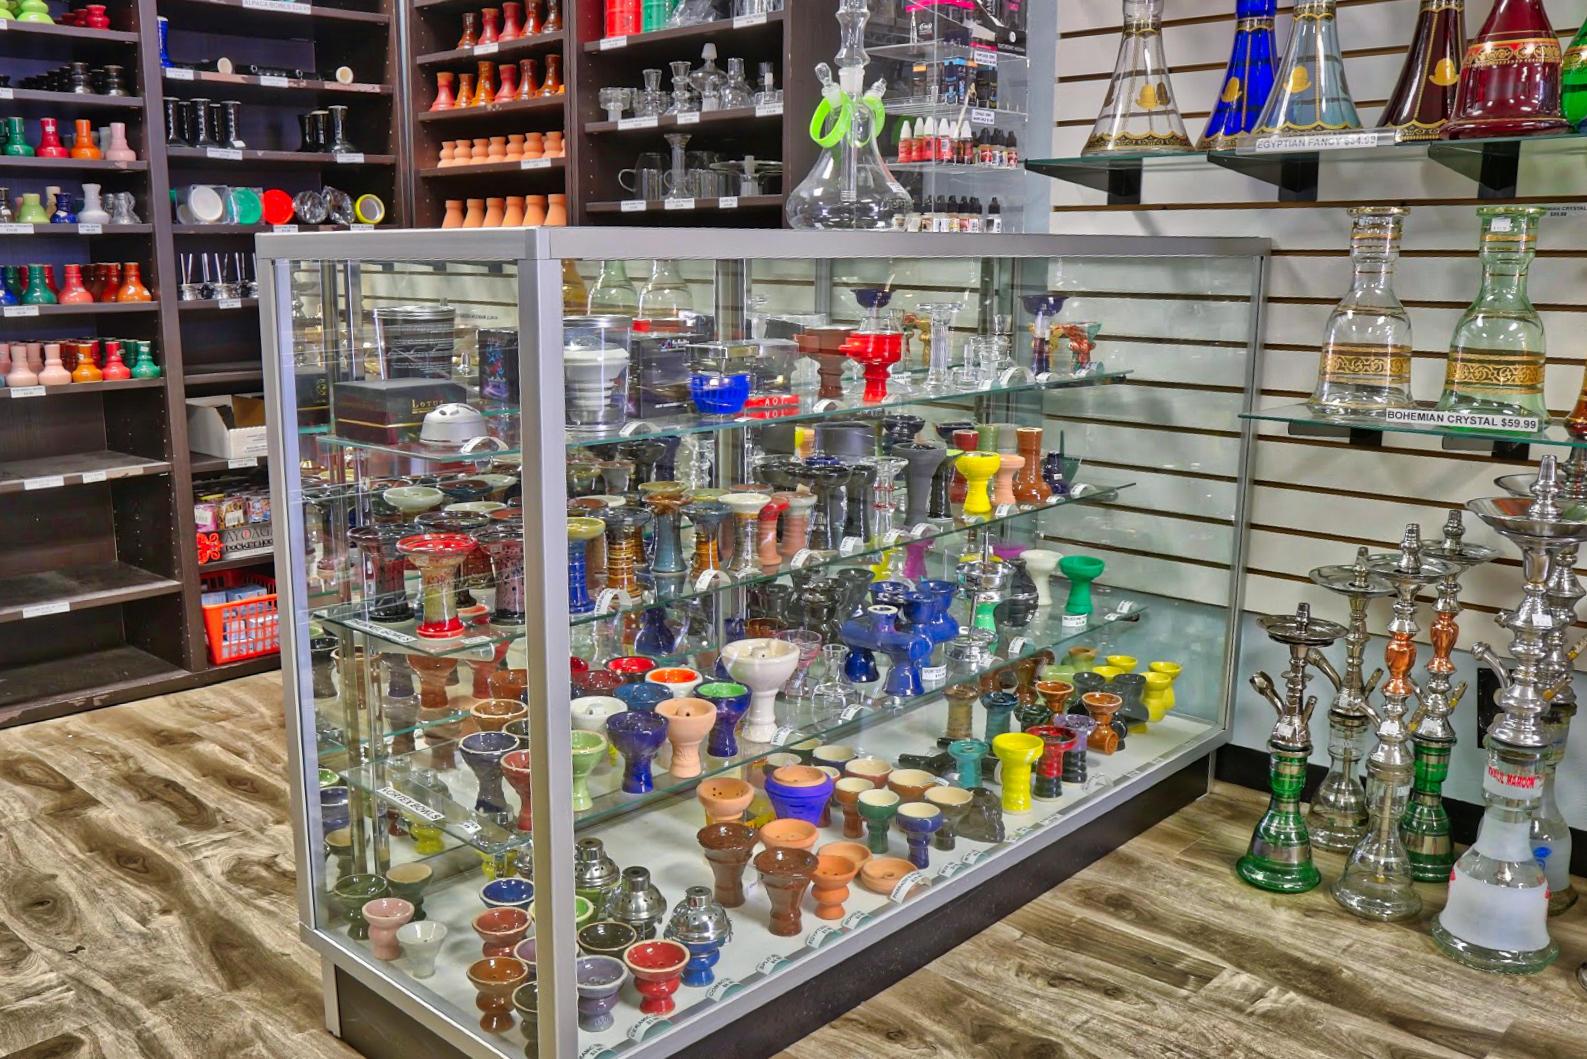 Texas Hookah Store - Smoke Shop - Houston, TX 77054